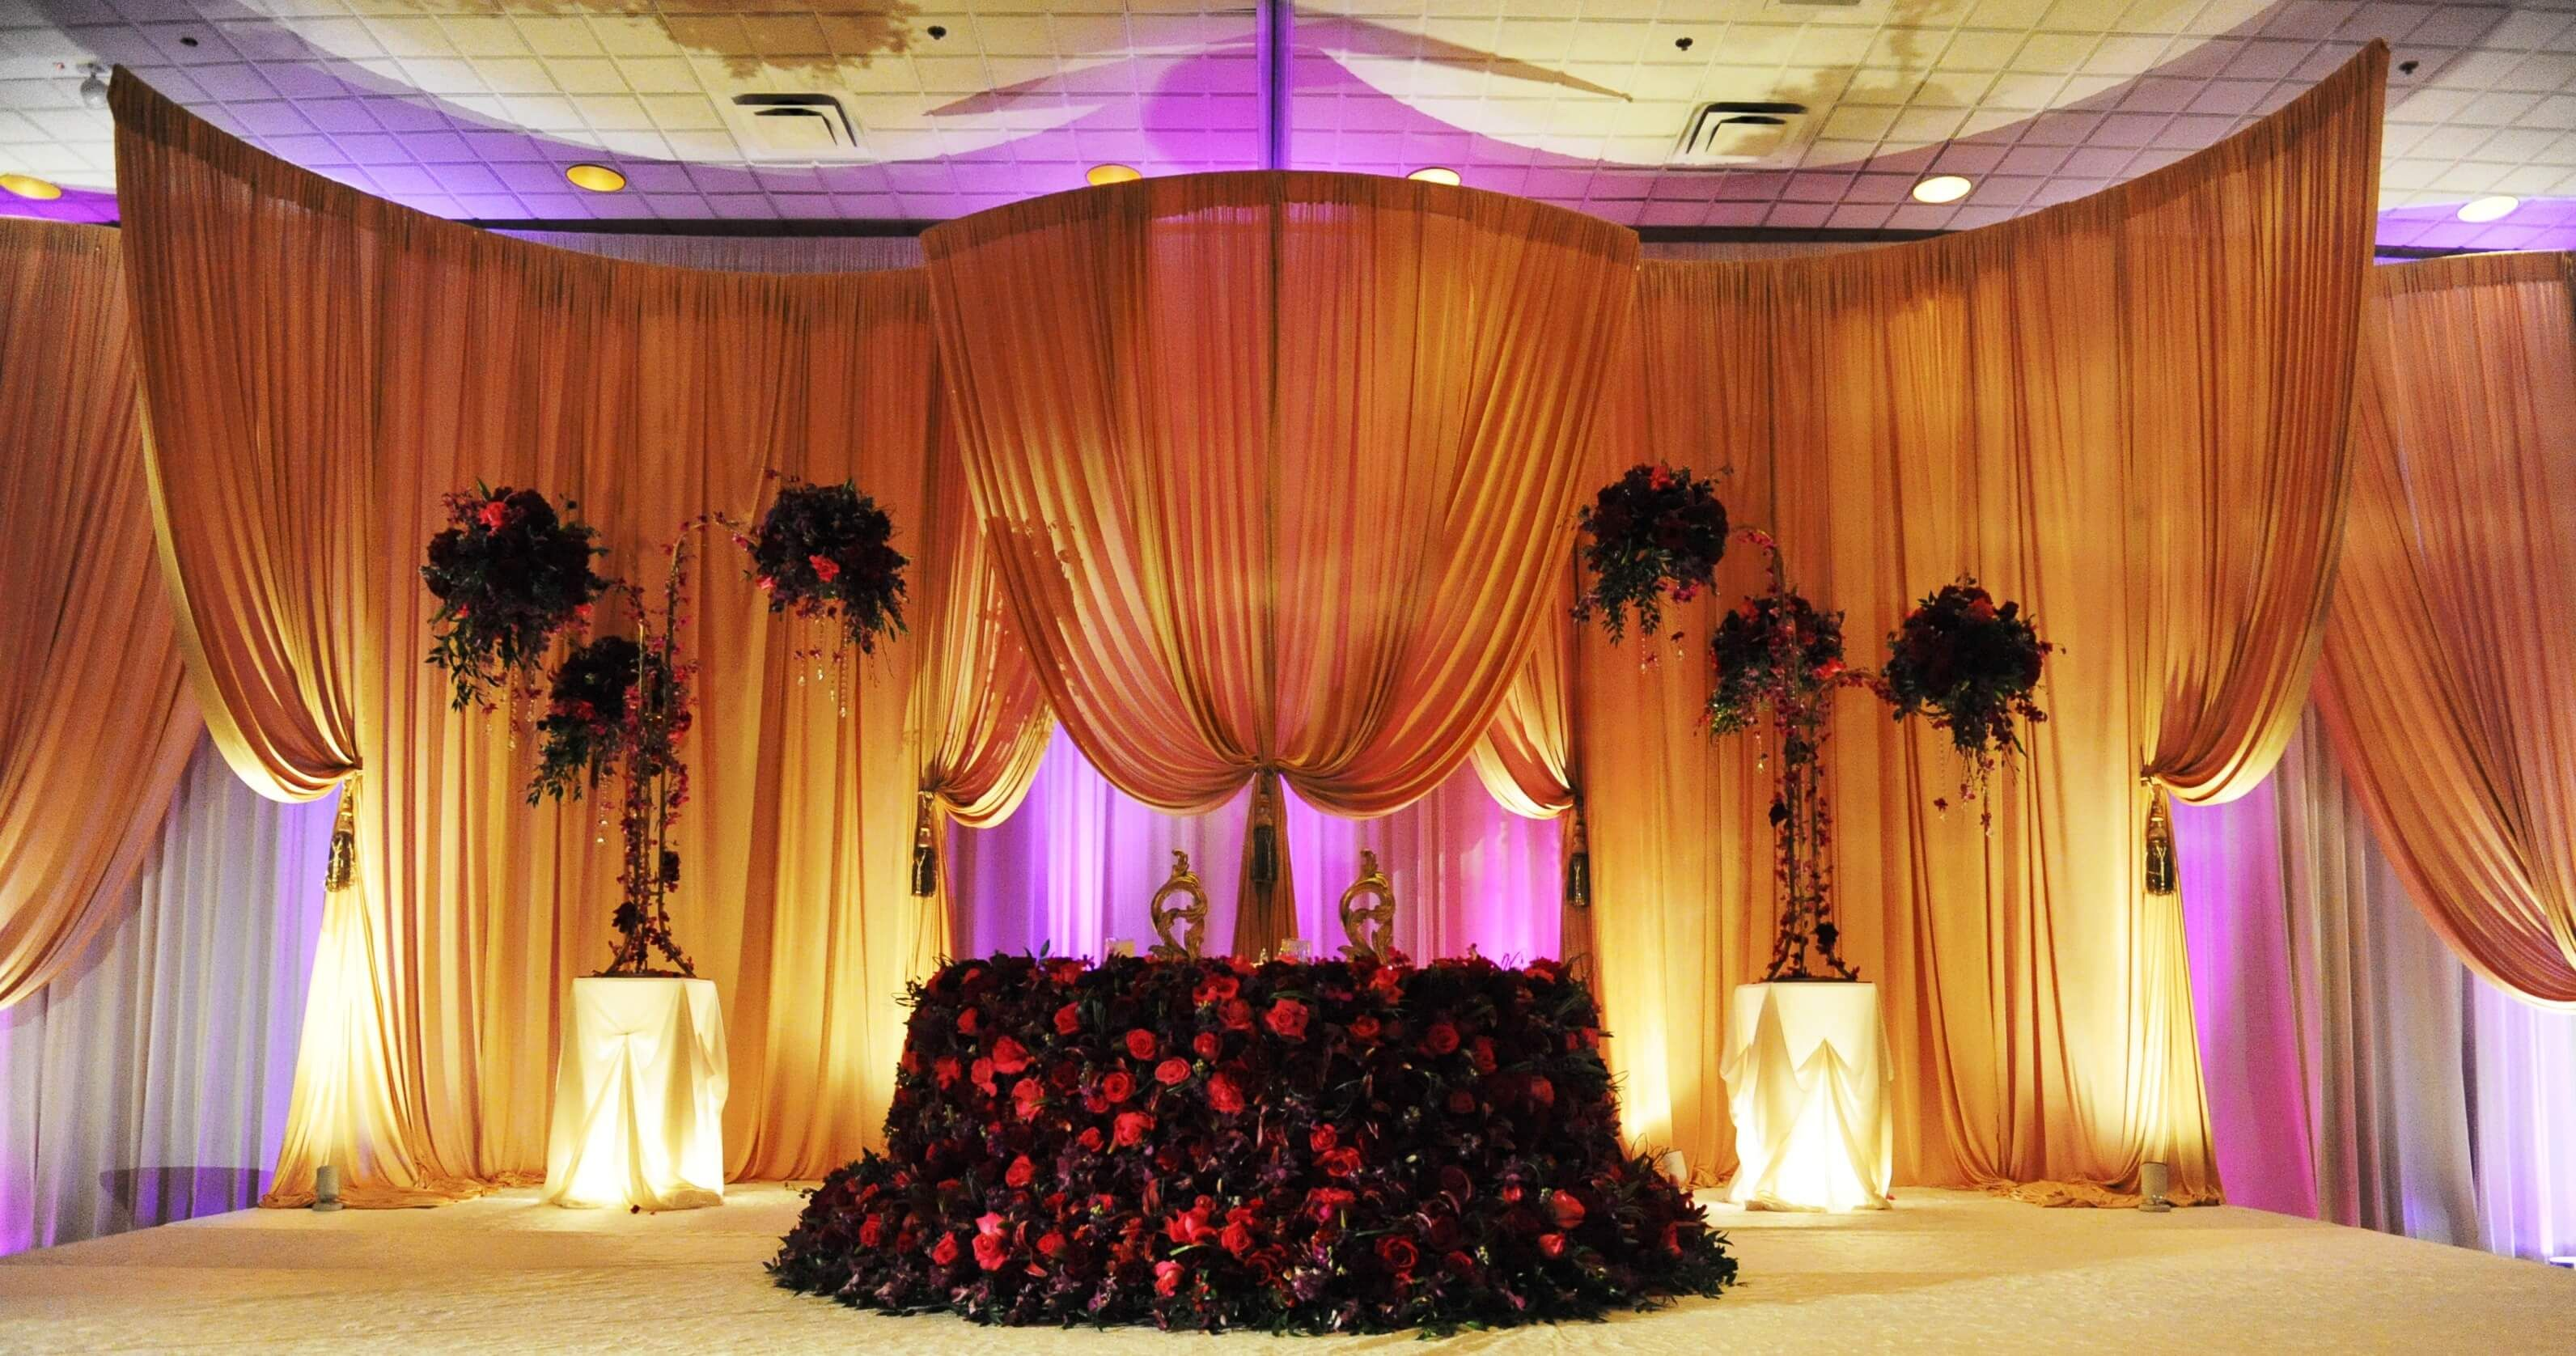 Wedding Flowers And Decorations Decor Wedding Backdrop Rentals Backdrop Decorations